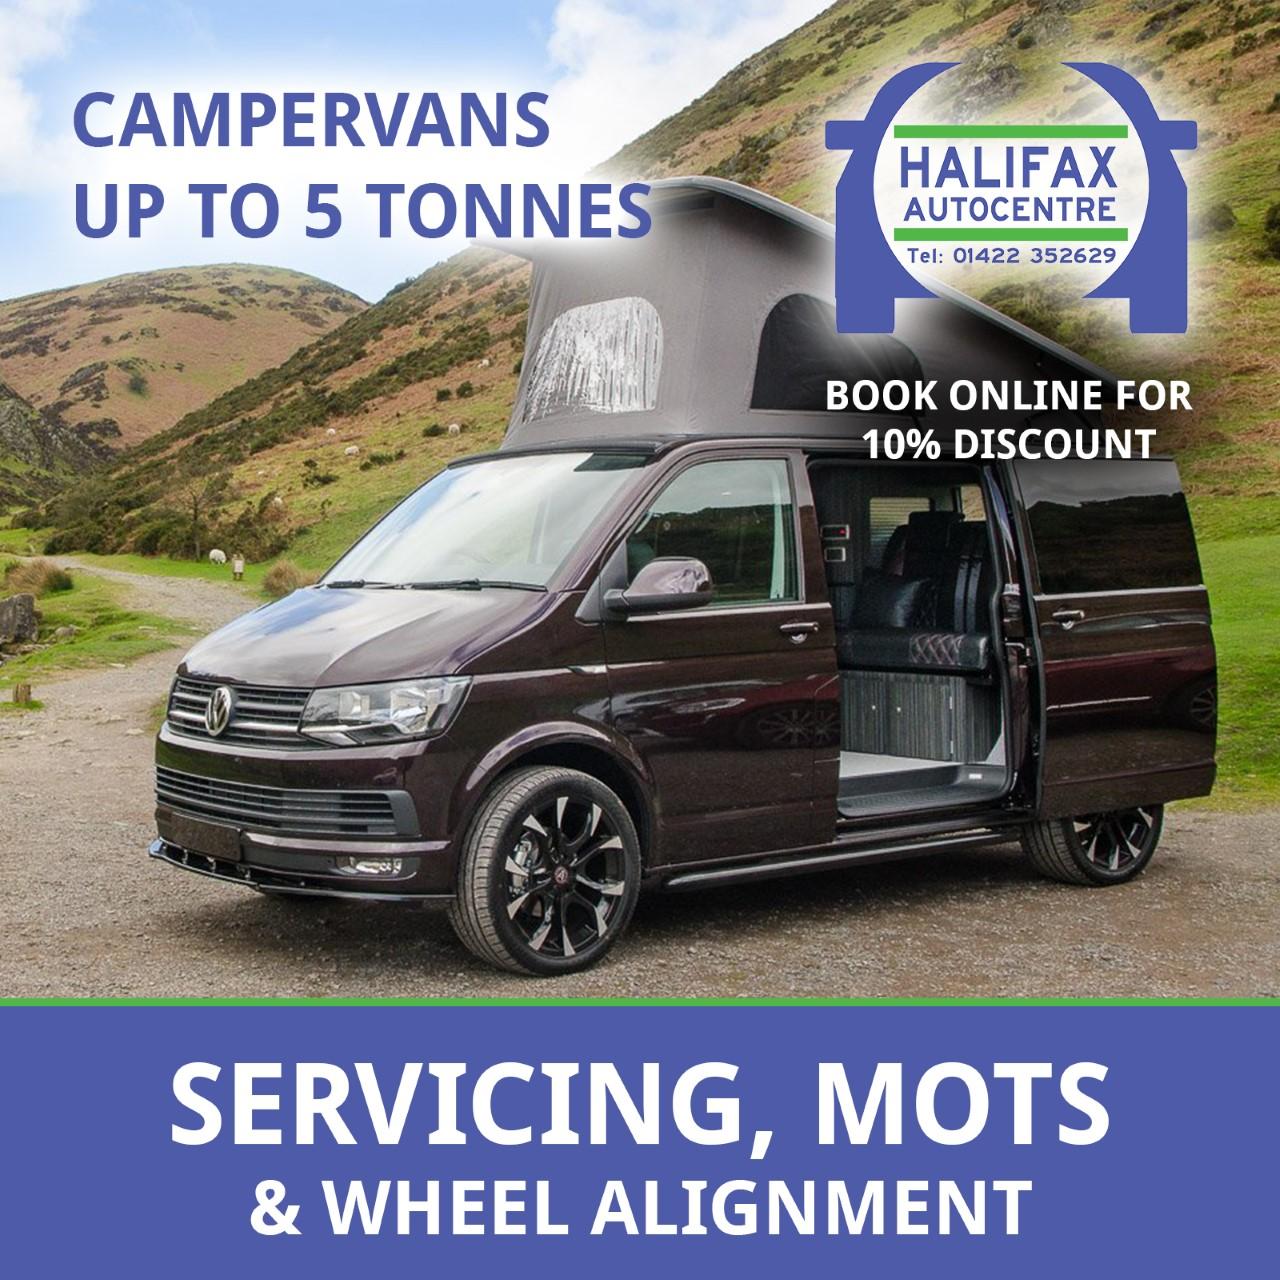 Halifax Autocentre - Campervan MOTs